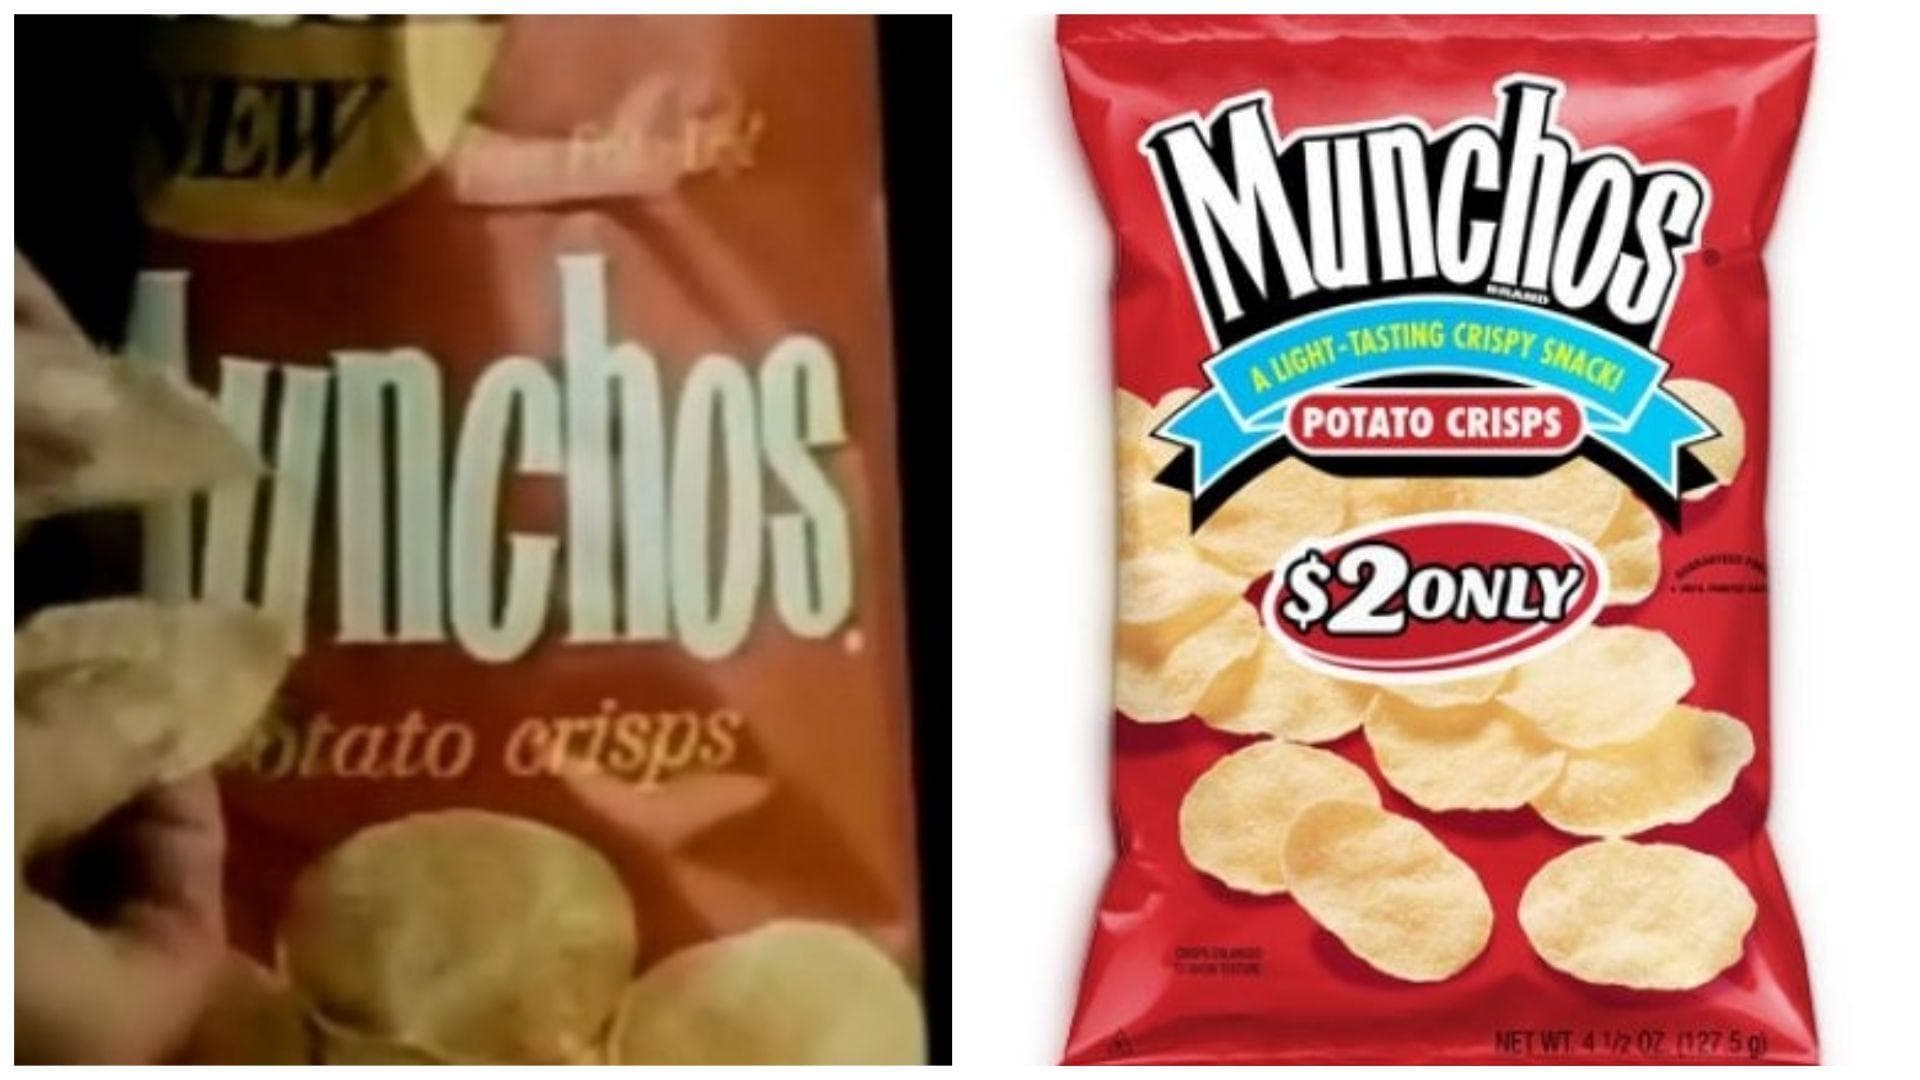 Munchos, 1972 Vs. 2019 on Random Potato Chip Bags Have Changed Over Tim